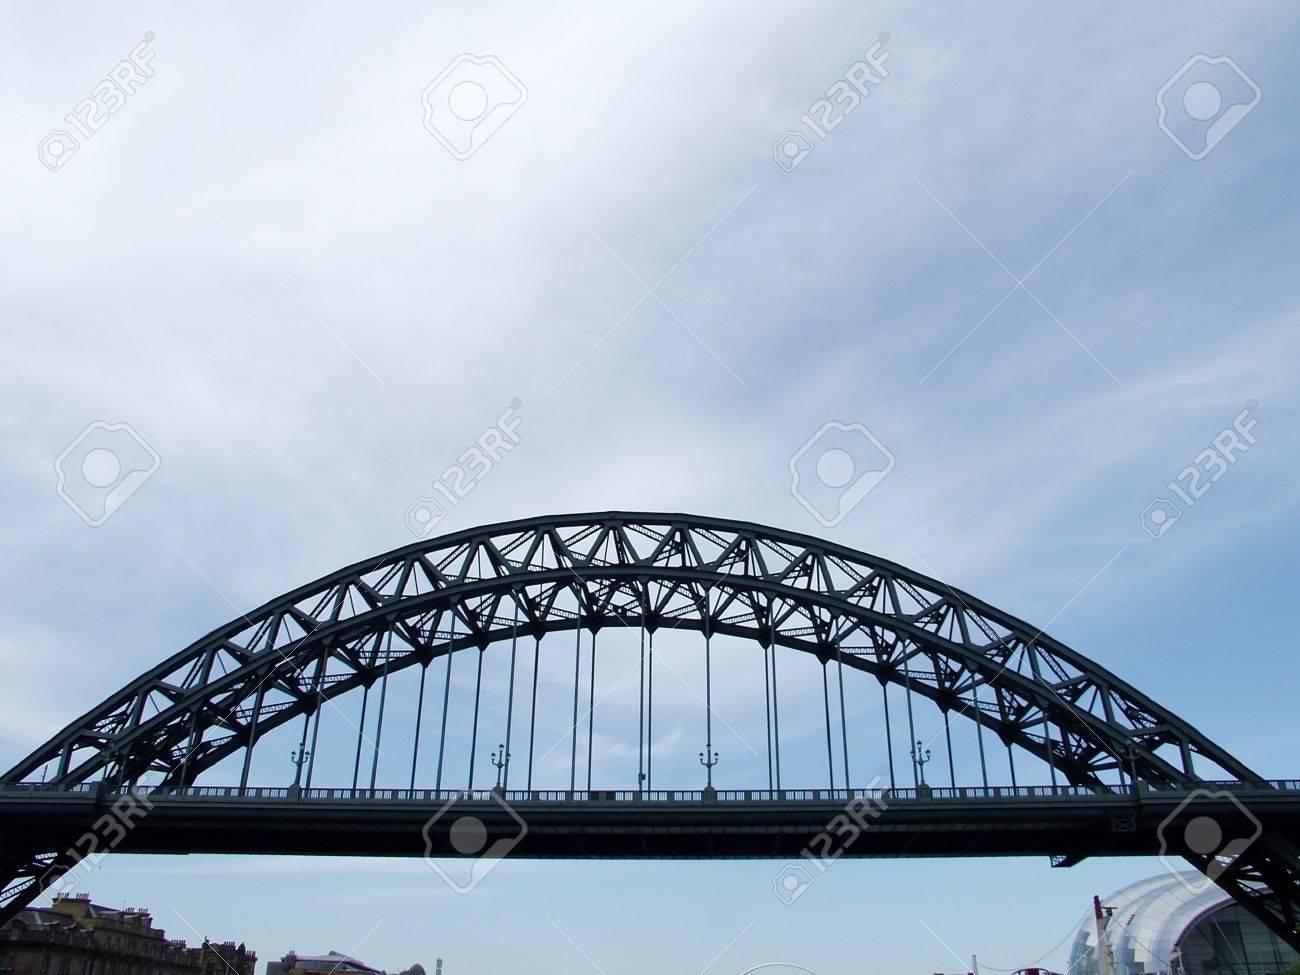 Tyne Bridge famous landmark in Newcastle upon Tyne with  sage gateshead on the background Stock Photo - 1404902